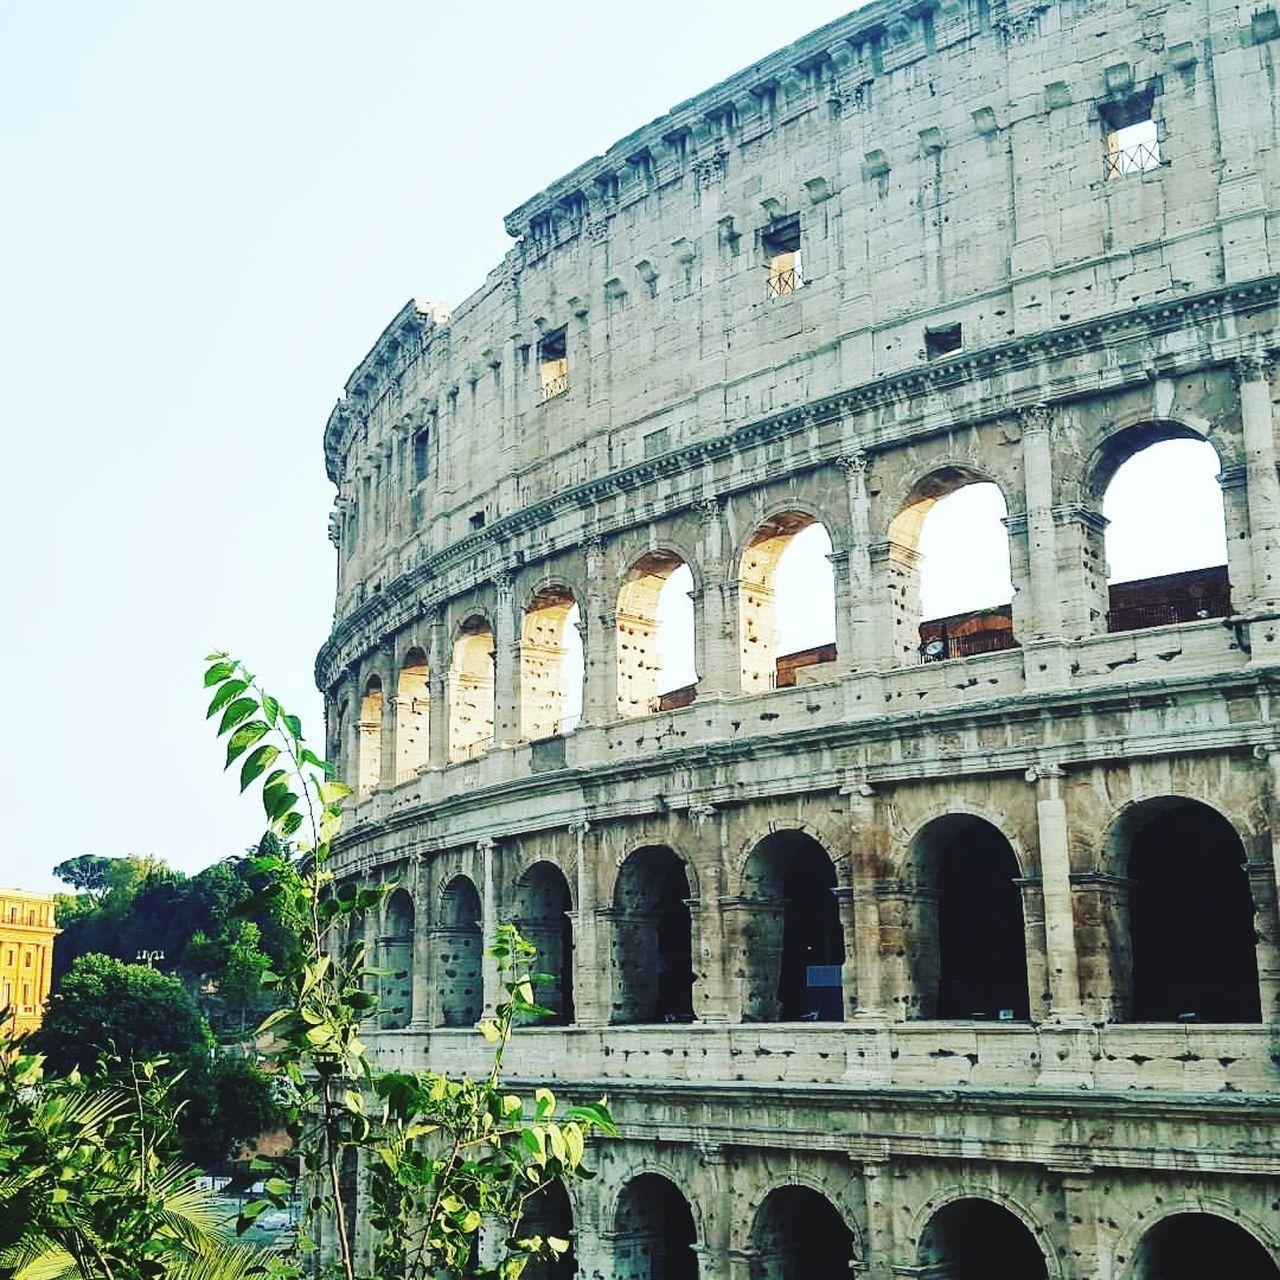 Architecture History Tourism Colloseum Rome Italy Ancient Built Structure Architecture